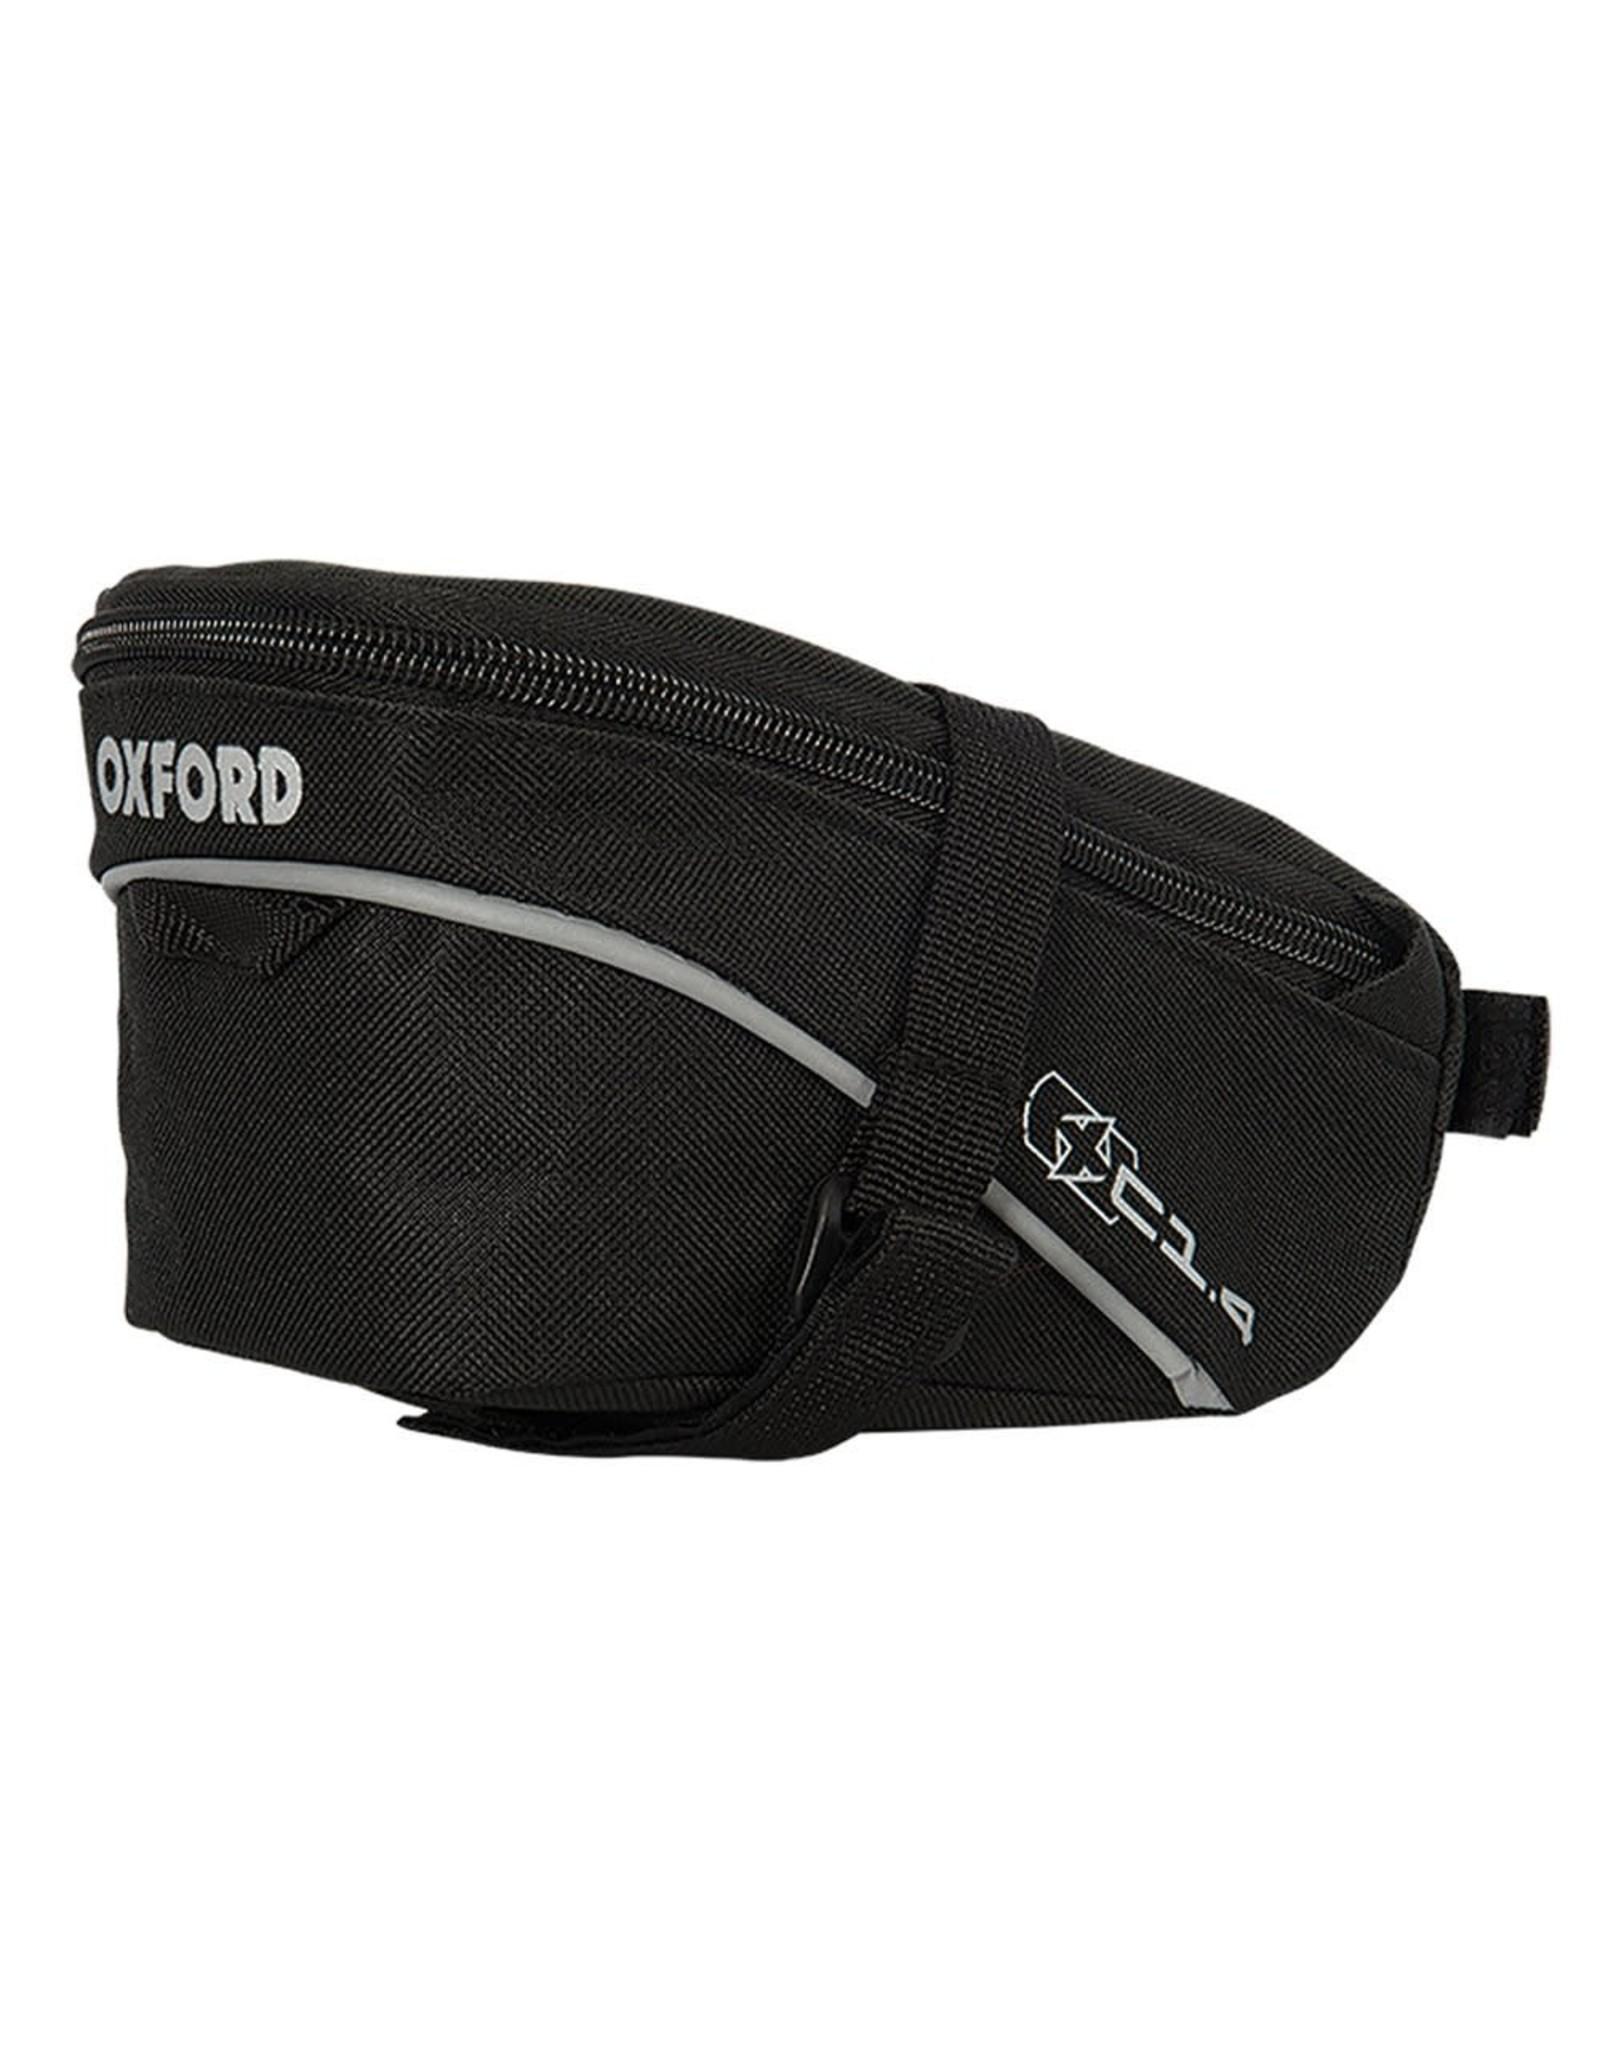 OXFORD C1.4 WEDGE BAG 1.4L